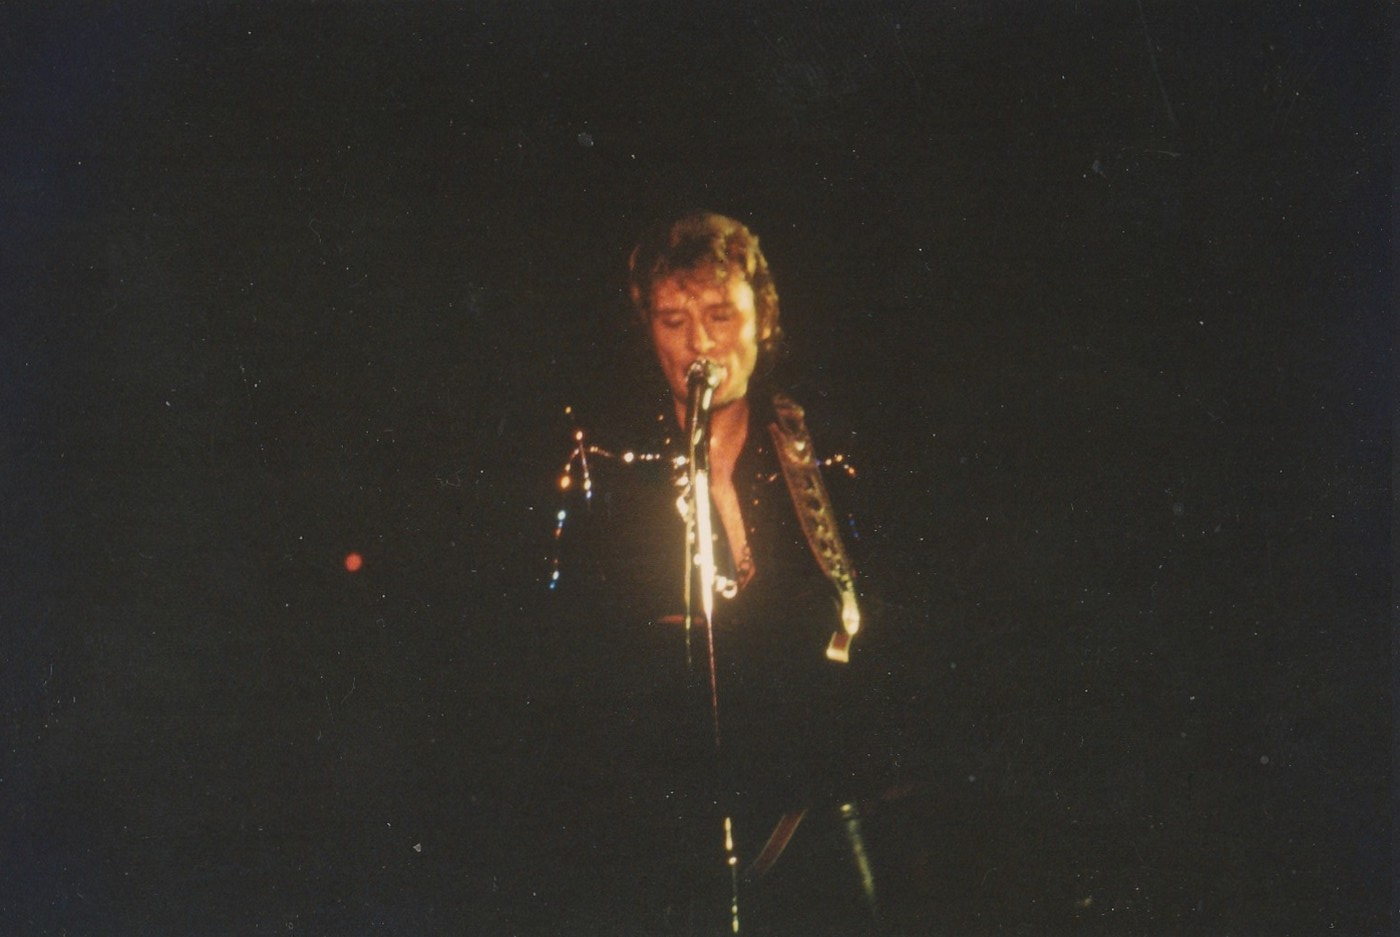 INÉDIT  :  JOHNNY HALLYDAY EN TOURNEE - HIVER 1978 -1979 ( PHOTOS INÉDITES )   Img_2641